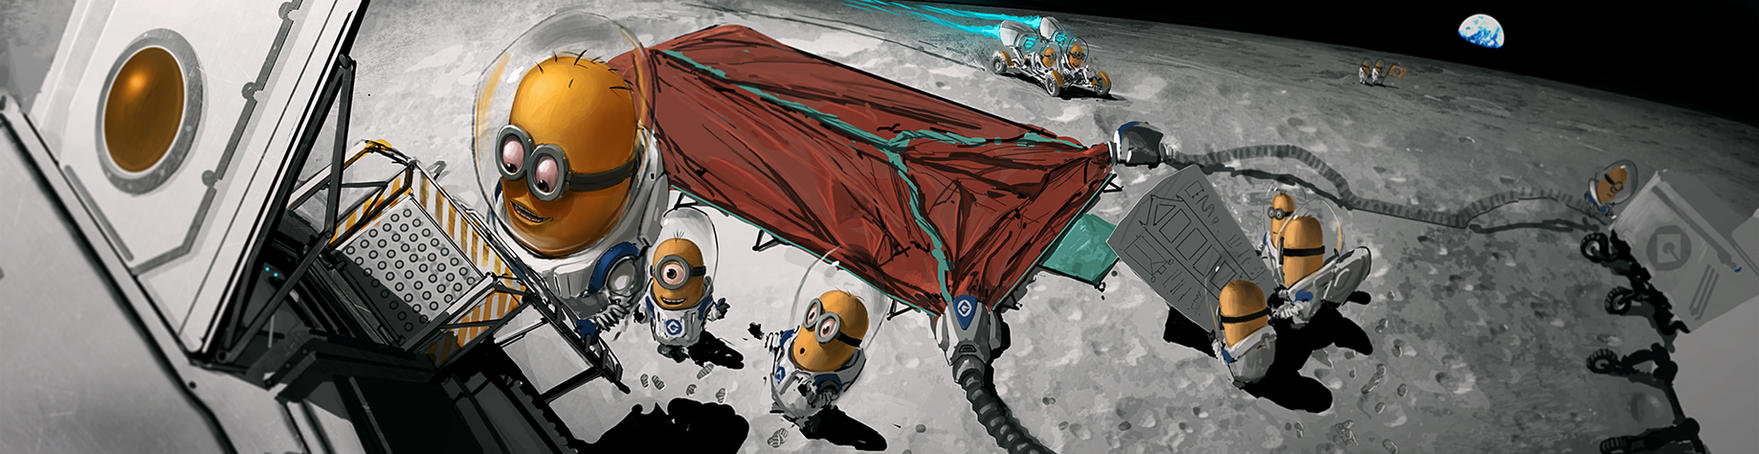 Minion Moon Adventure by HippyHoudini